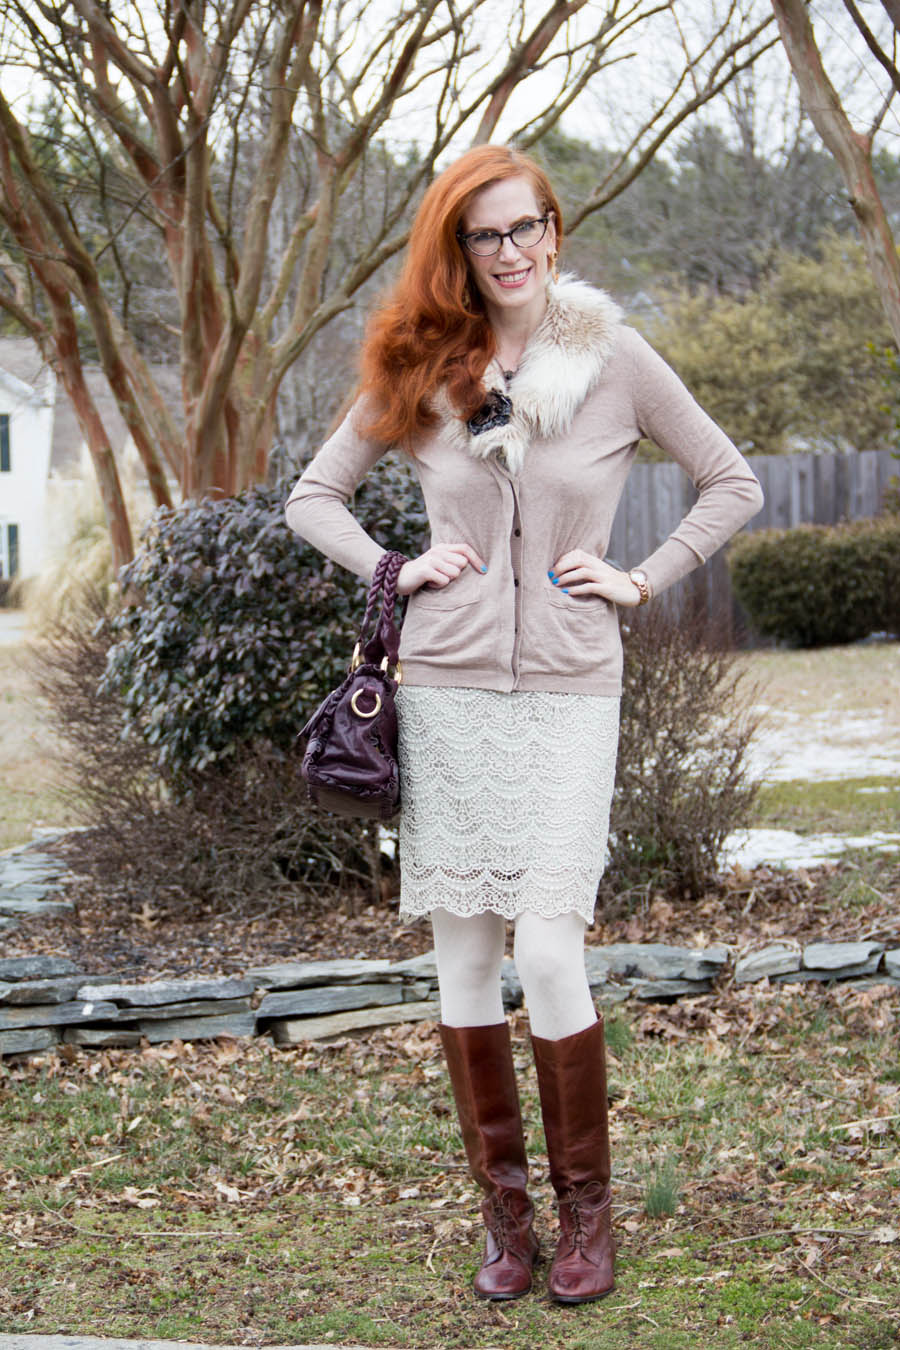 45821142a1 Karina Dresses  Giveaway Dec - Elegantly Dressed and Stylish ...